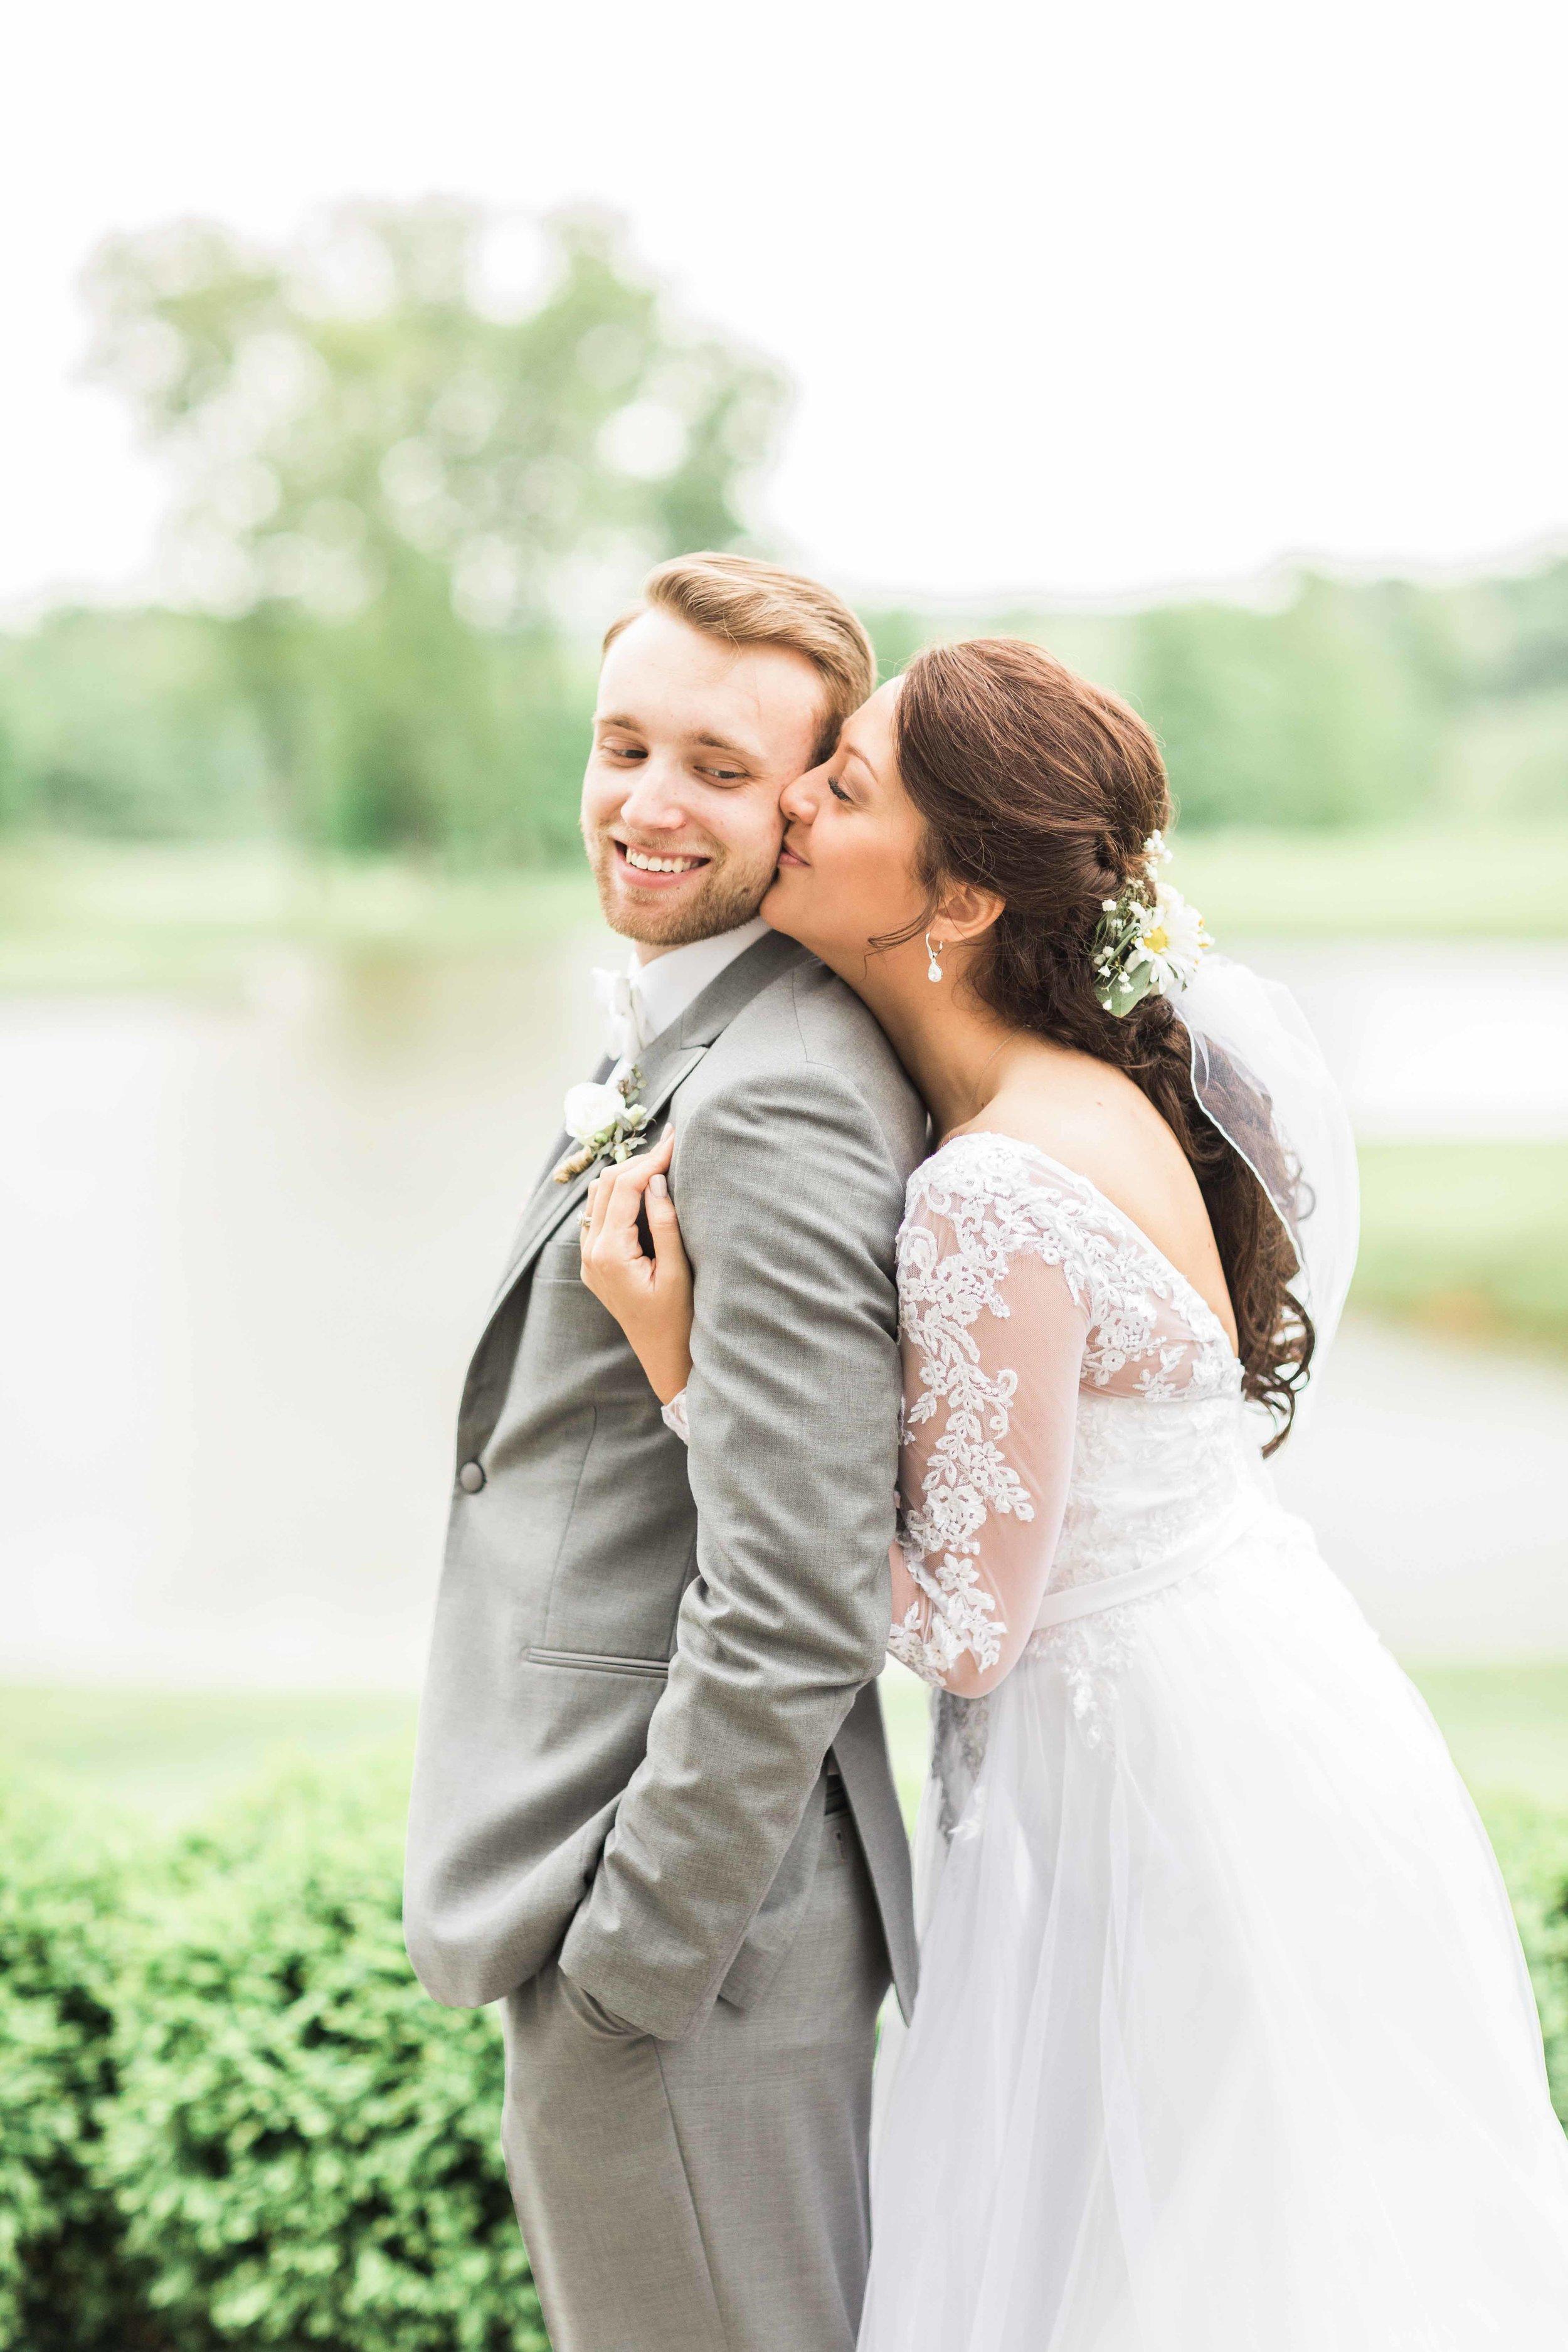 cincinnati wedding photographers lauren day photography-1.jpg